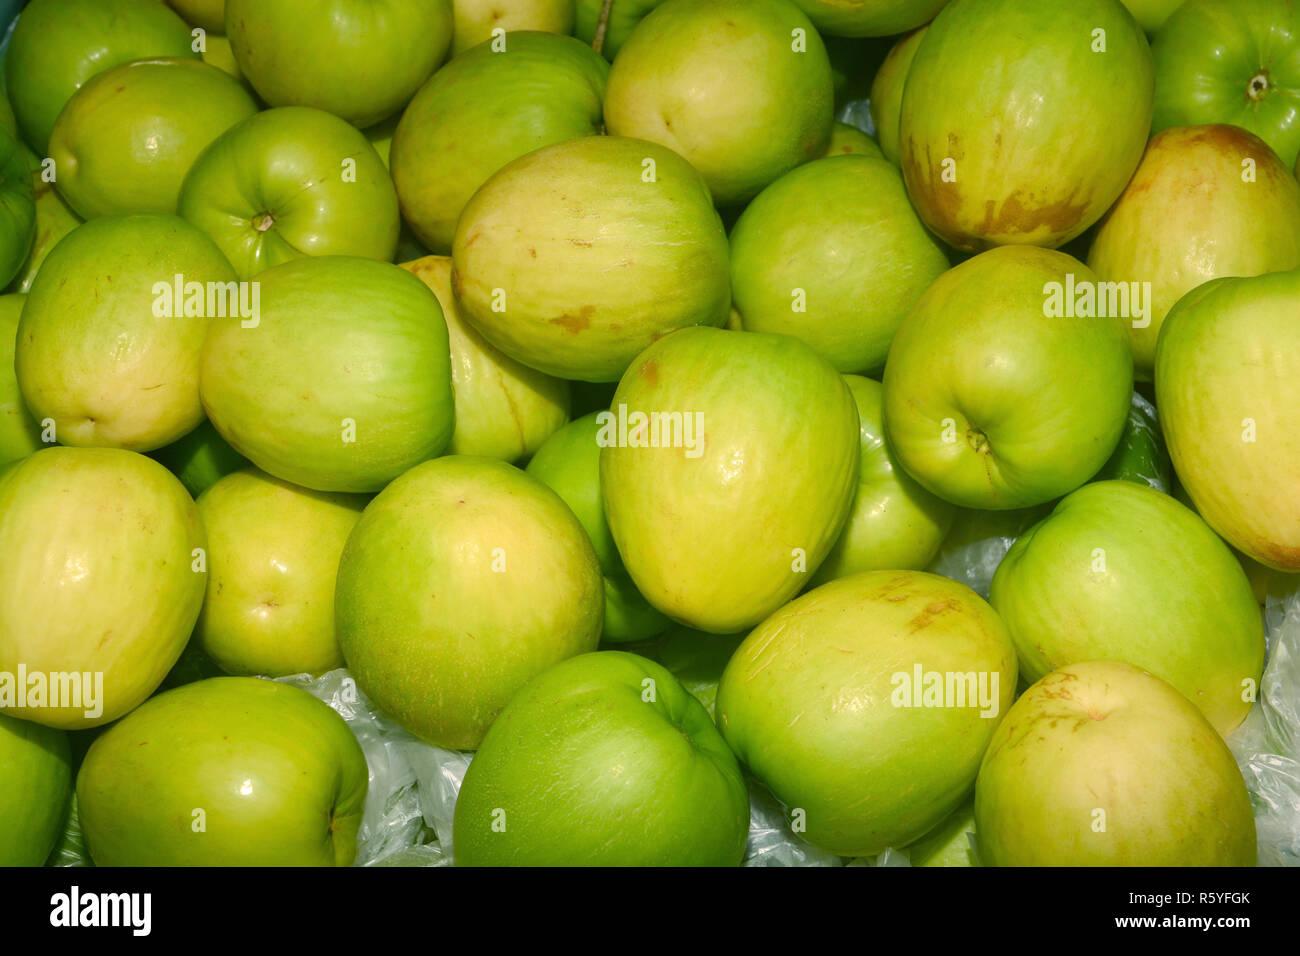 Indian Jujube Apple Stock Photos & Indian Jujube Apple Stock Images